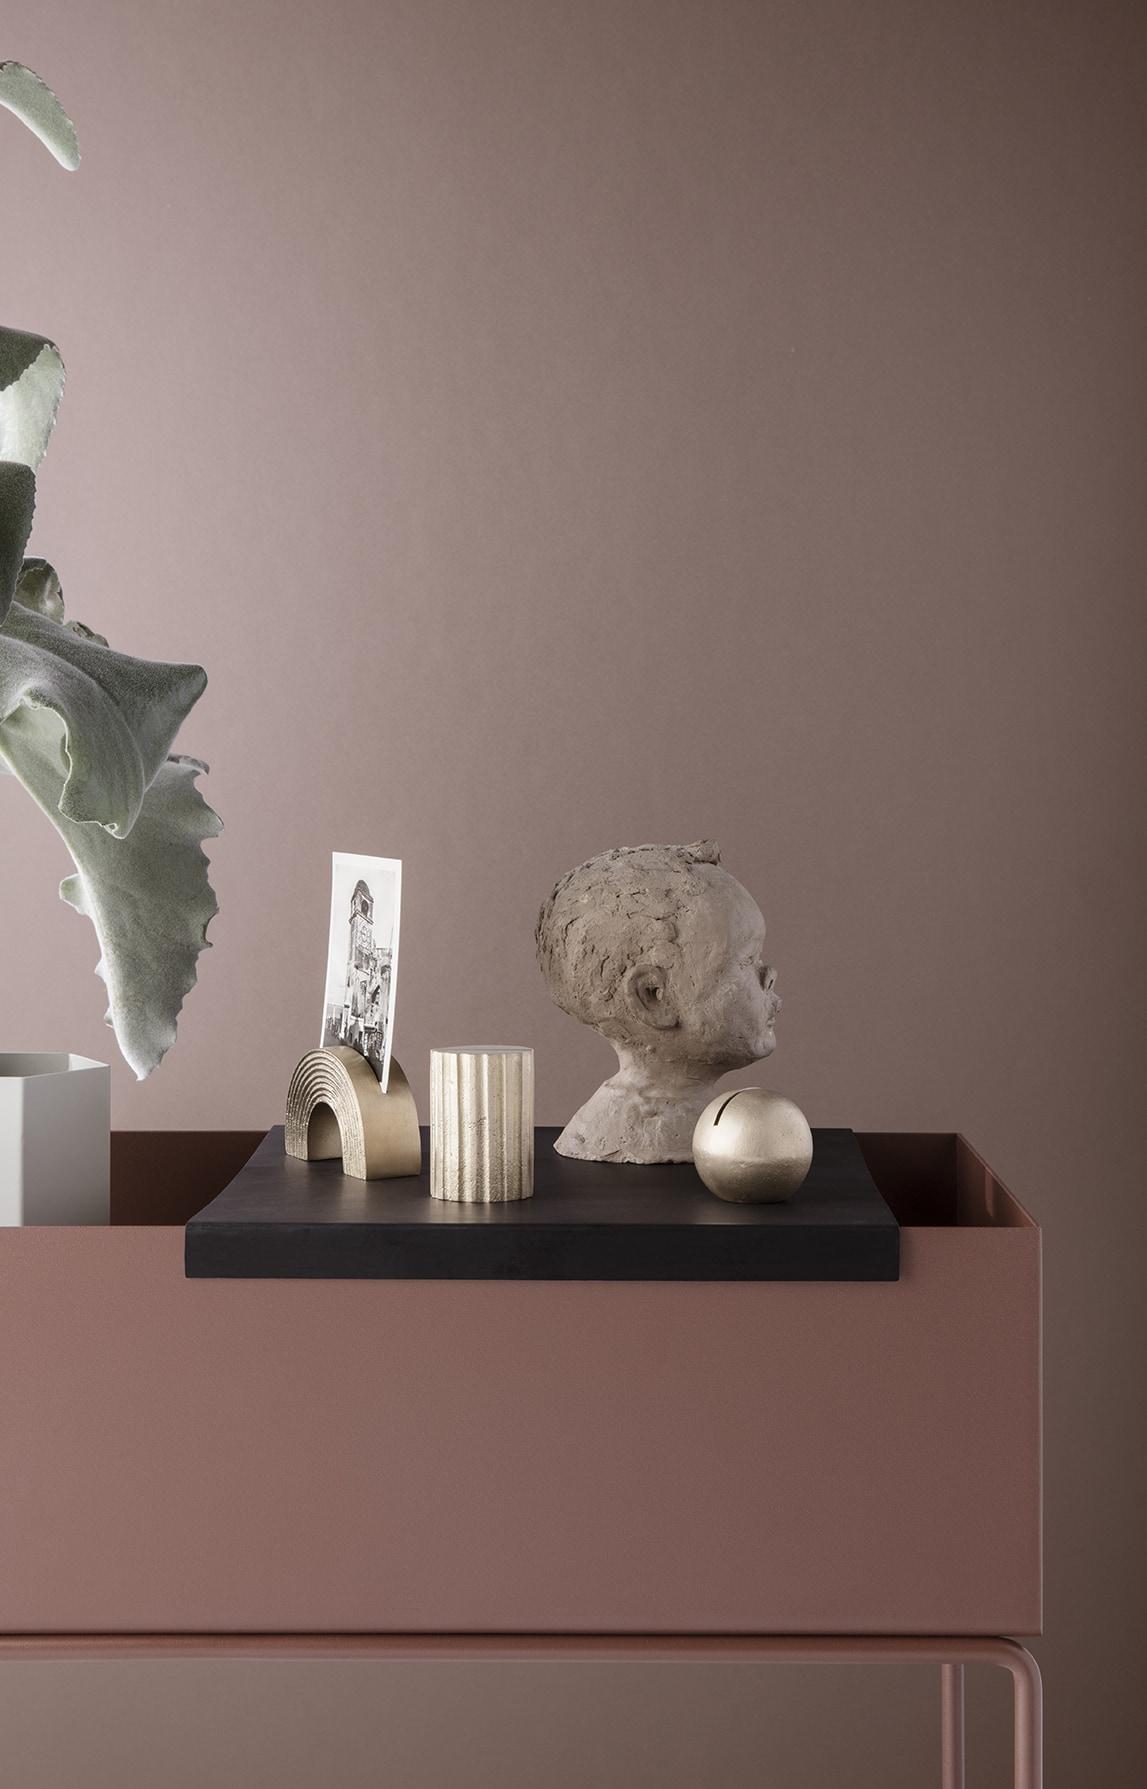 ferm living ss18 coco lapine designcoco lapine design. Black Bedroom Furniture Sets. Home Design Ideas